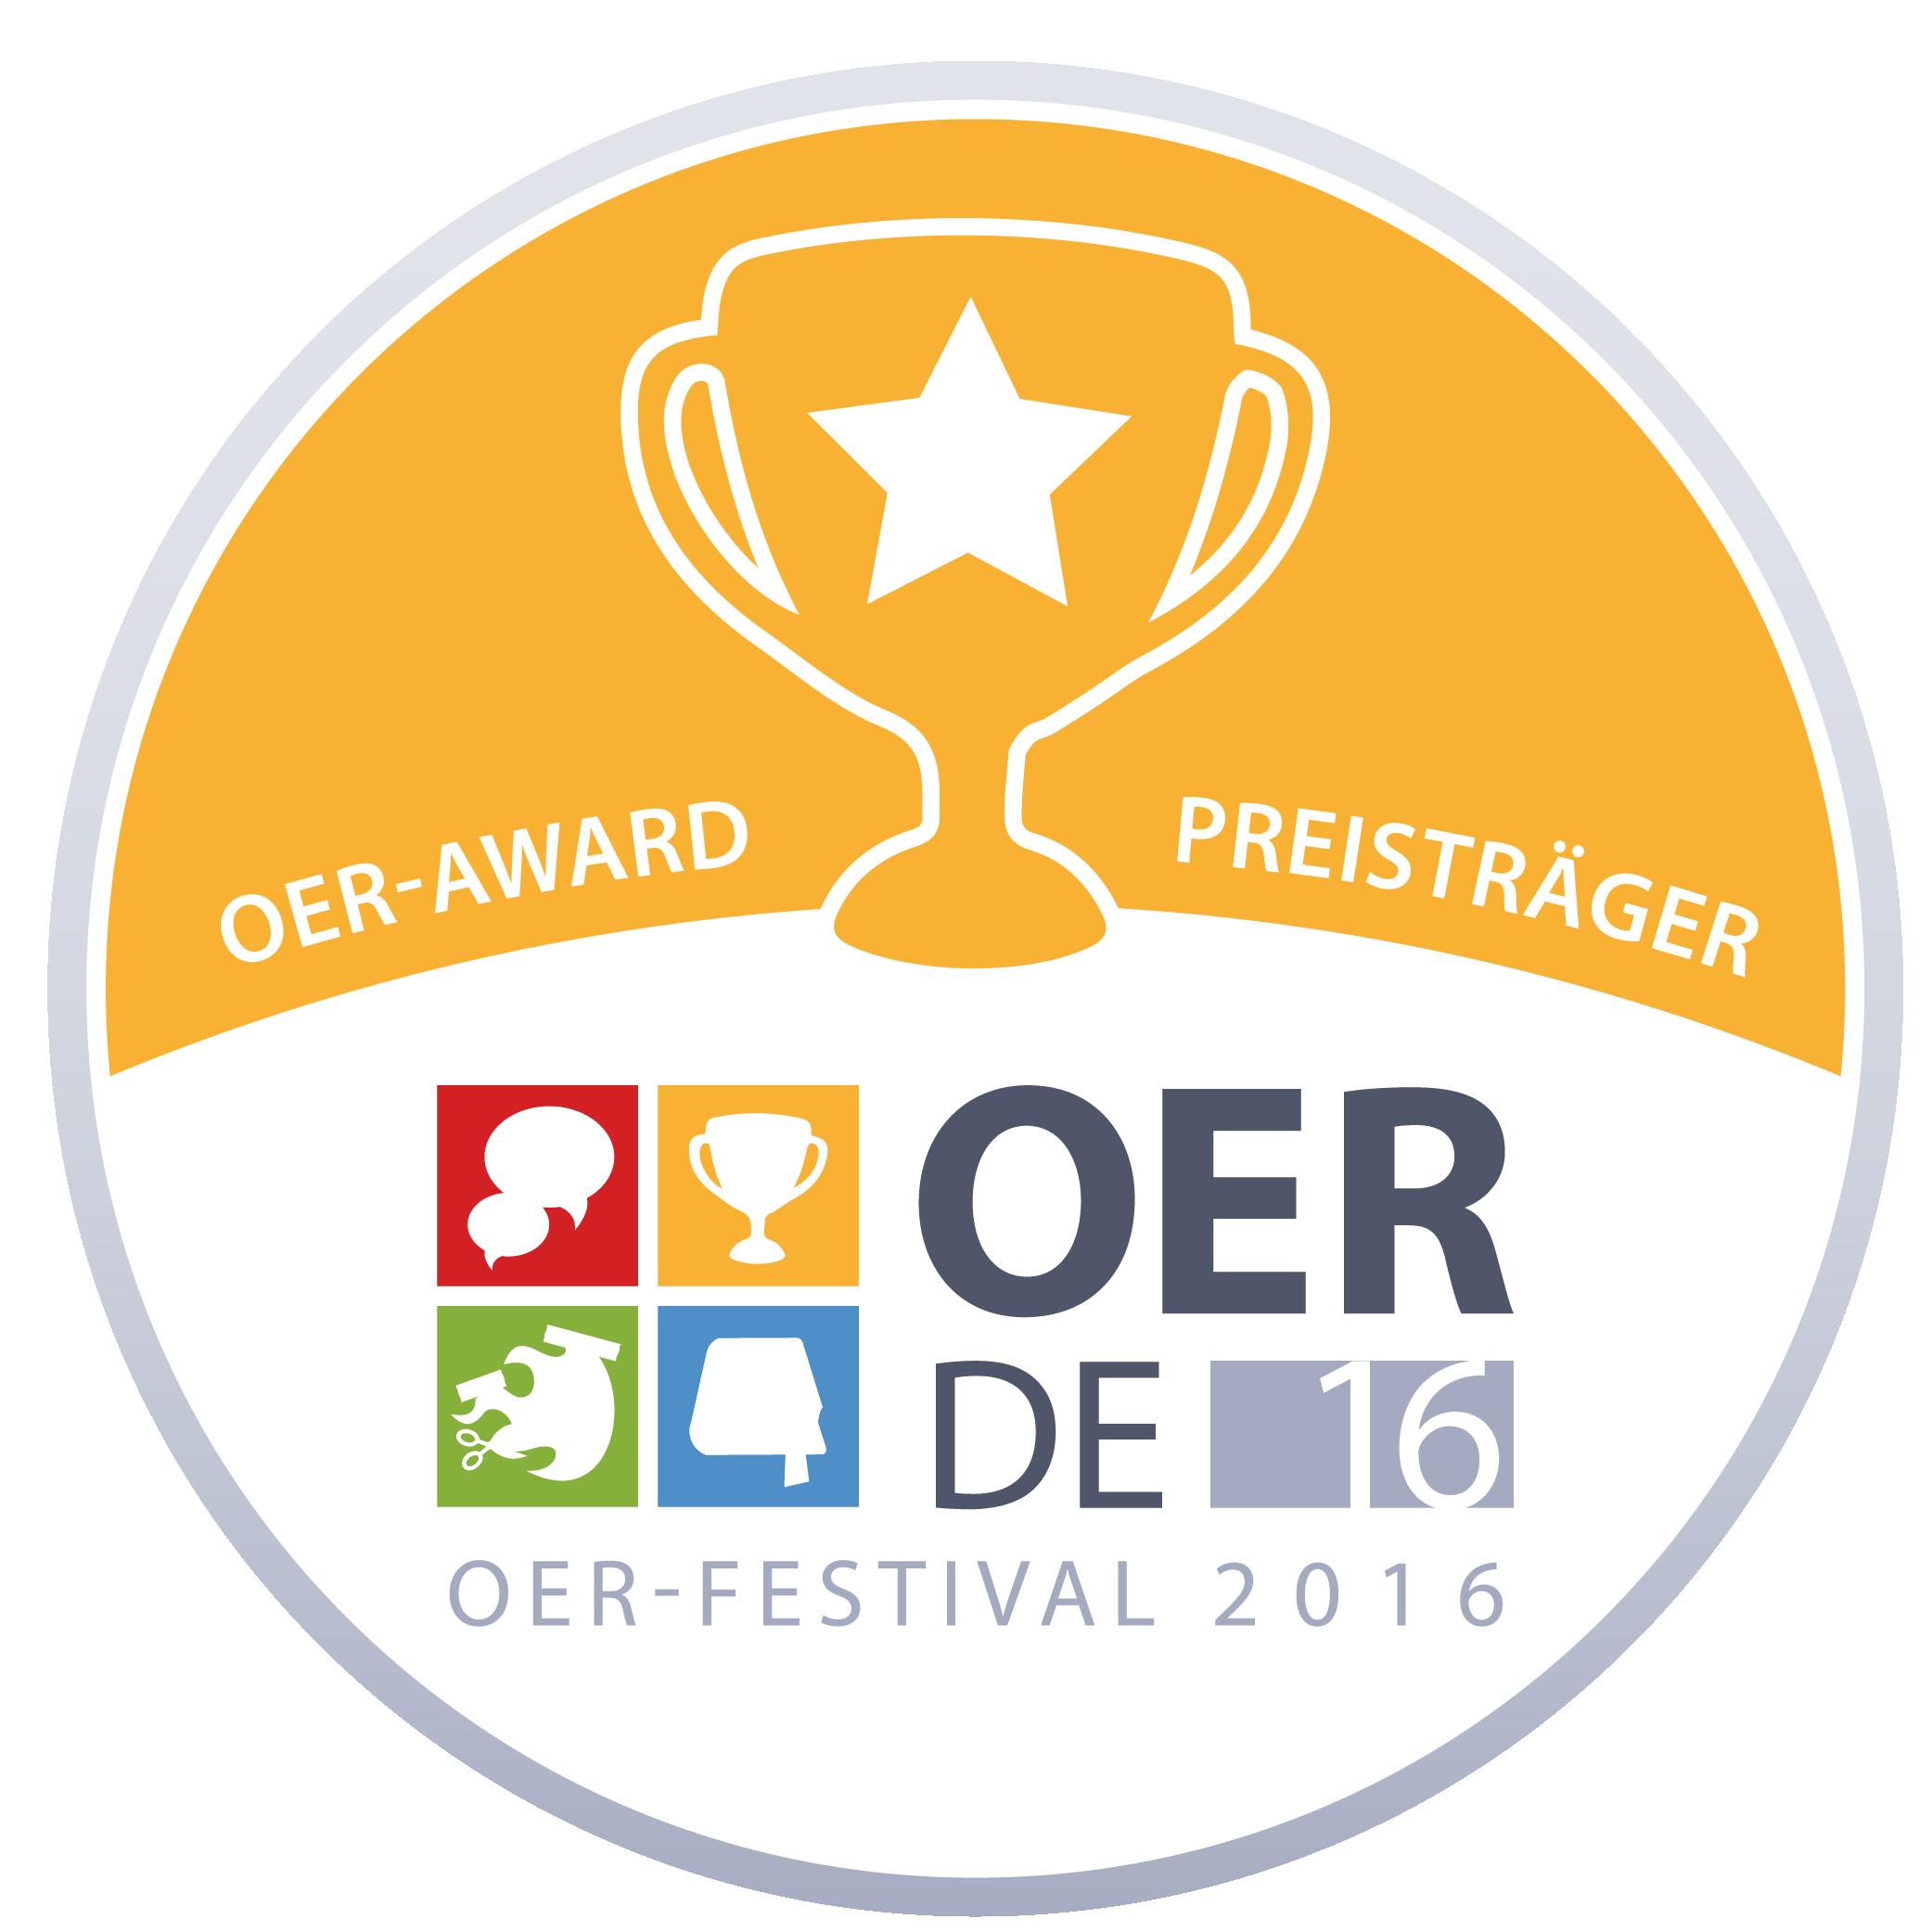 File:OER Festival 2016 - Badge - OER-Award.png - Award PNG